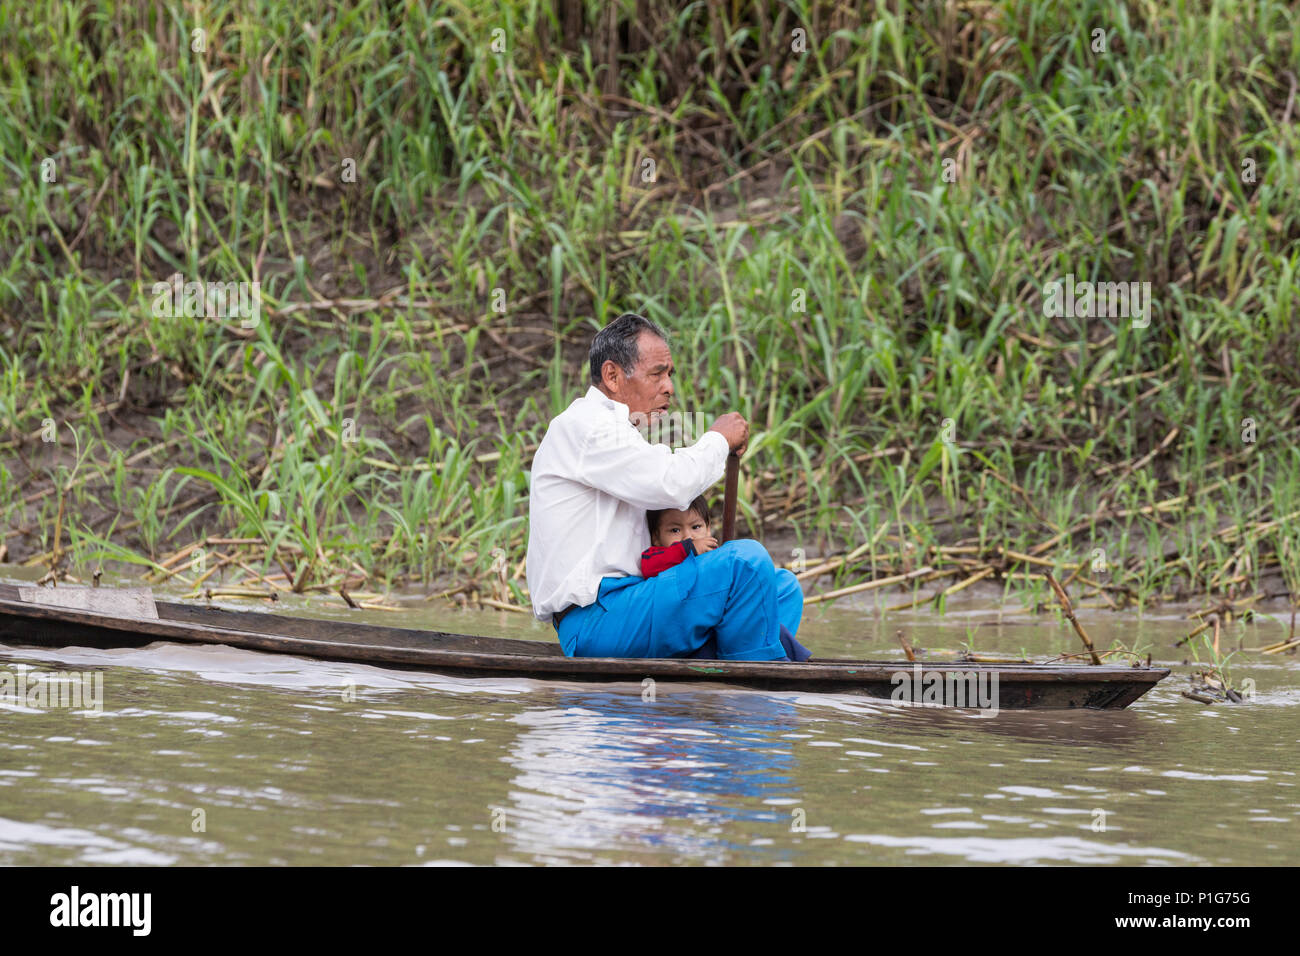 Man paddling dugout canoe, Puerto Miguel, Upper Amazon River Basin, Loreto, Peru - Stock Image